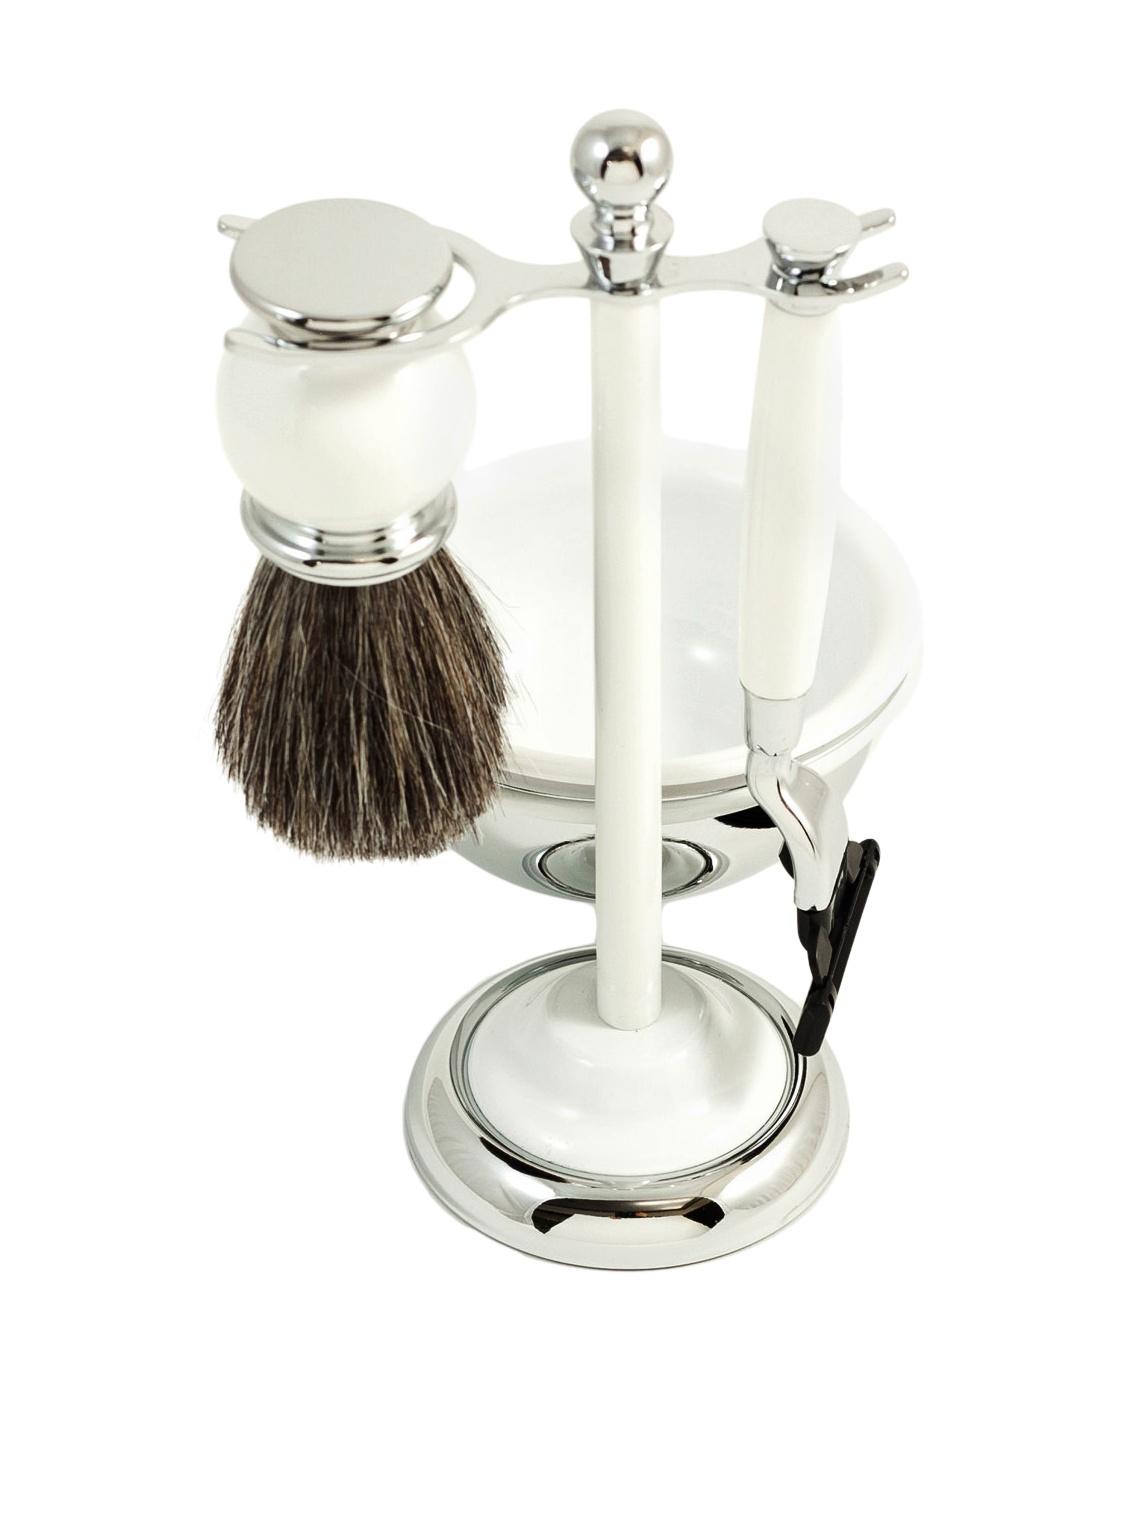 Four Piece Mach 3 Shave Set with Pure Badger Brush & Chrome Shavi... by Bey-Berk by Bey-Berk